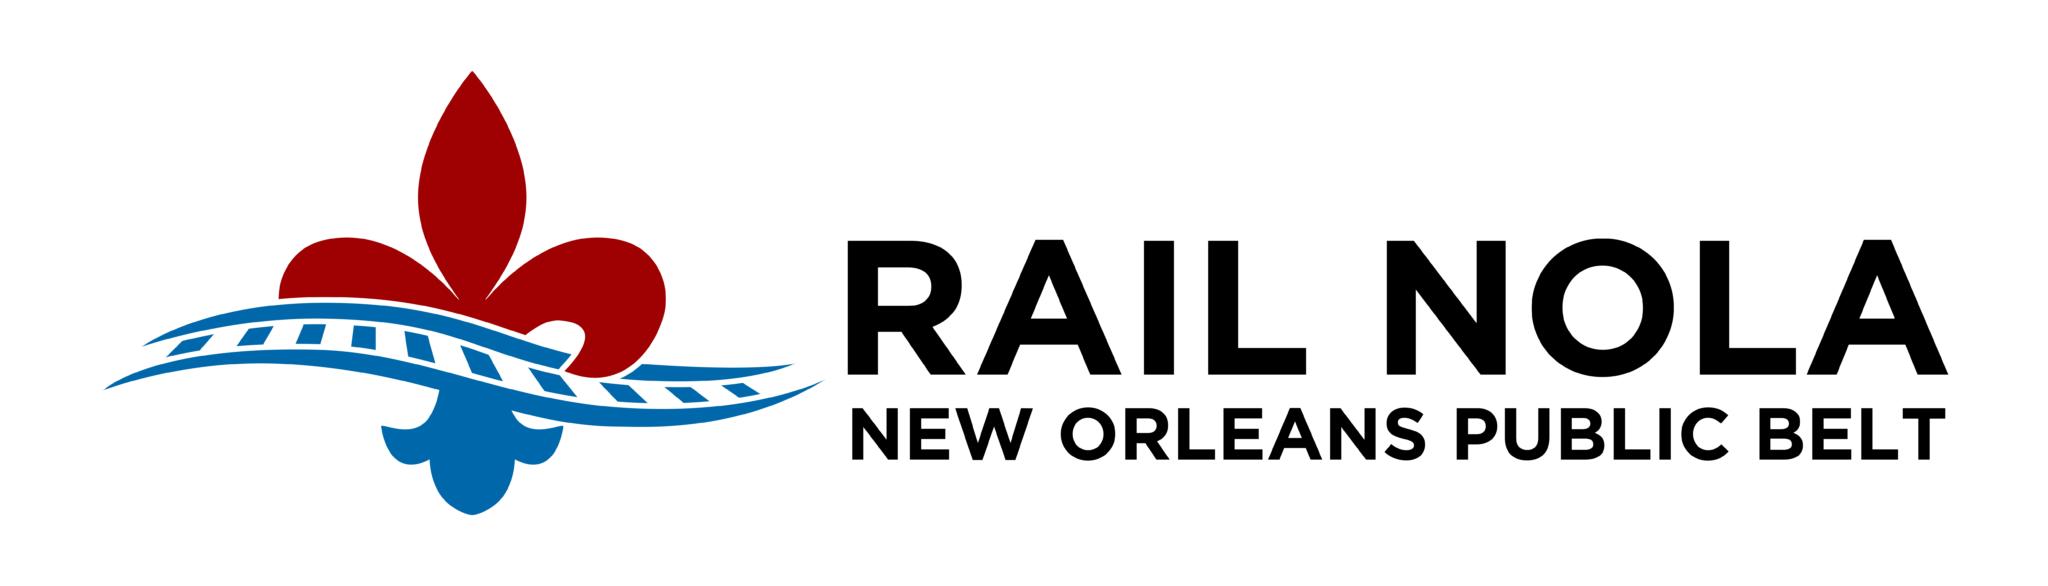 RailNOLA horizontal logo